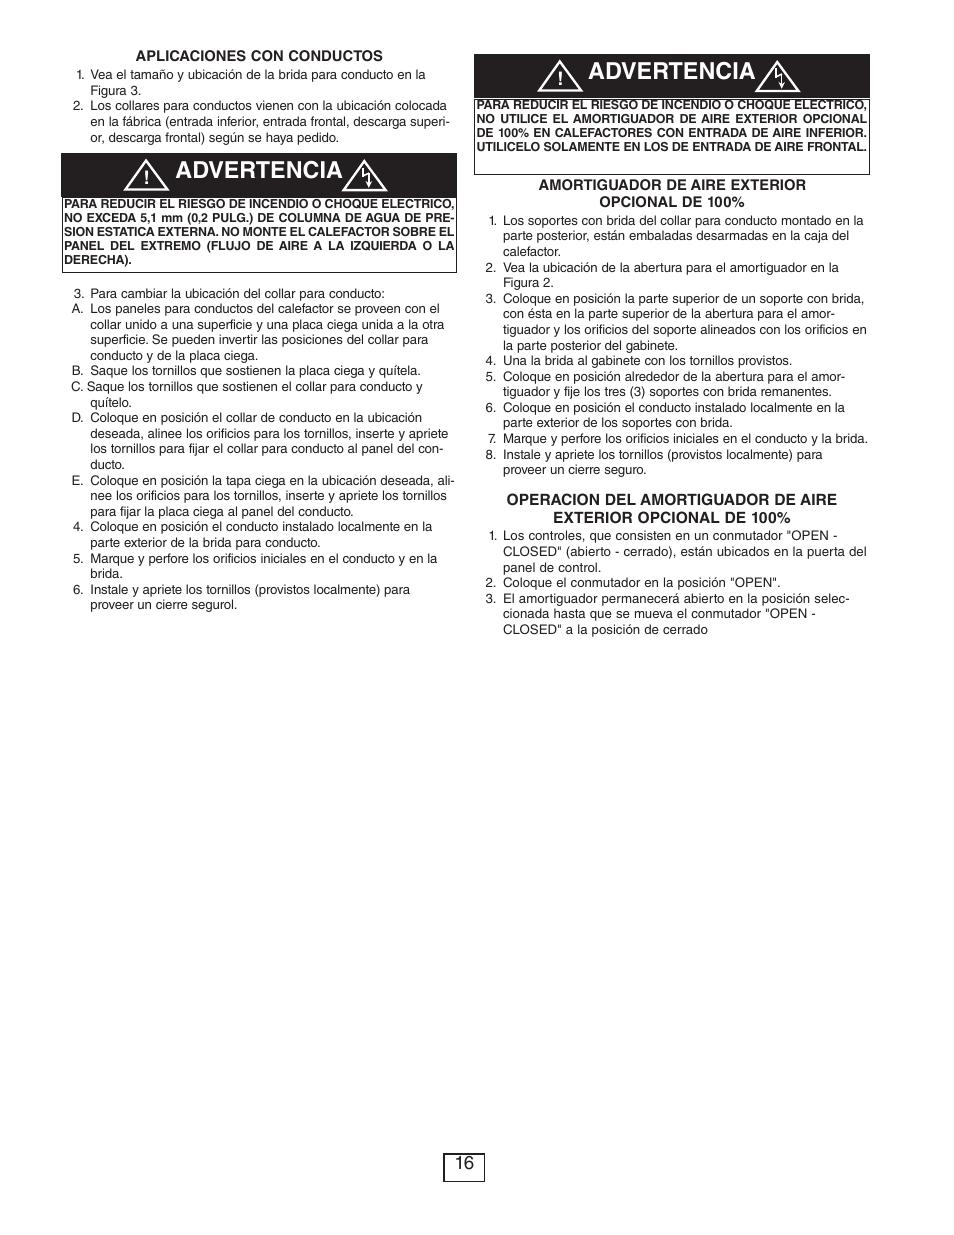 Advertencia | Qmark CUS900 - Stock Cabinet Unit Heater User Manual ...